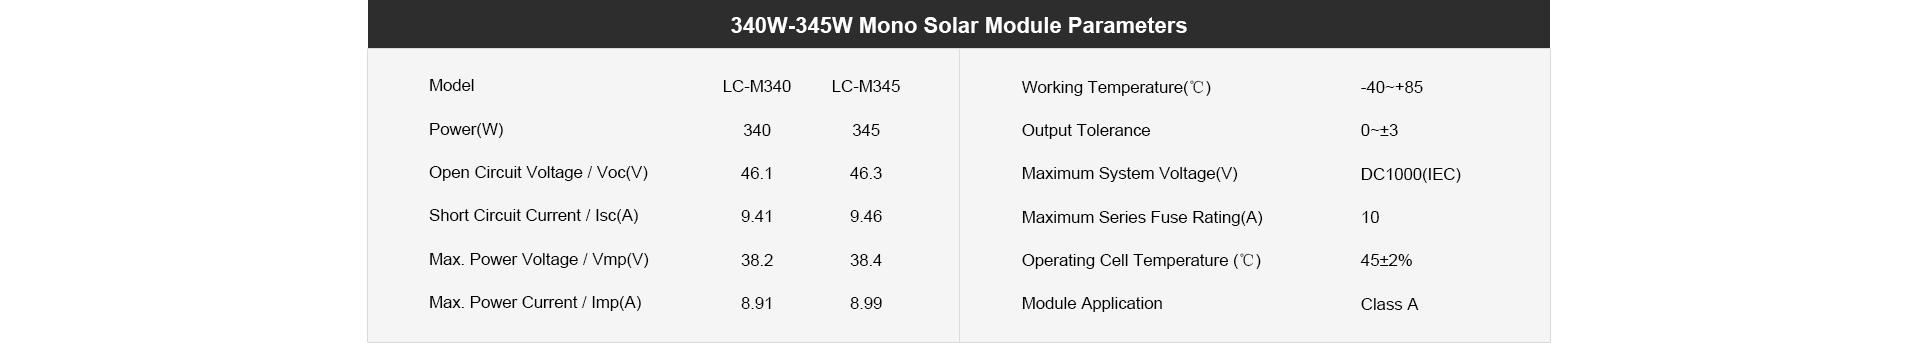 340W-345W Mono